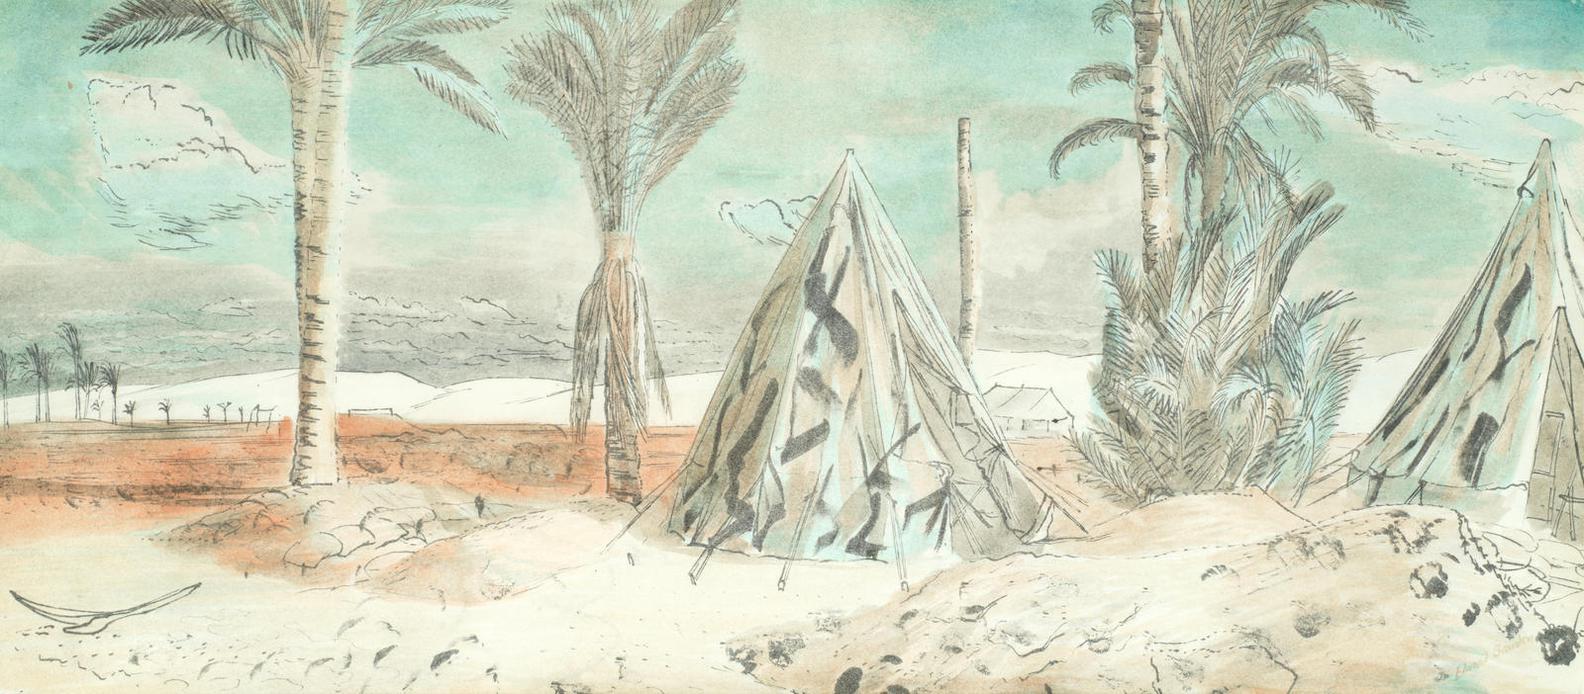 Edward Bawden-Padres Tent At Mersa Matruh-